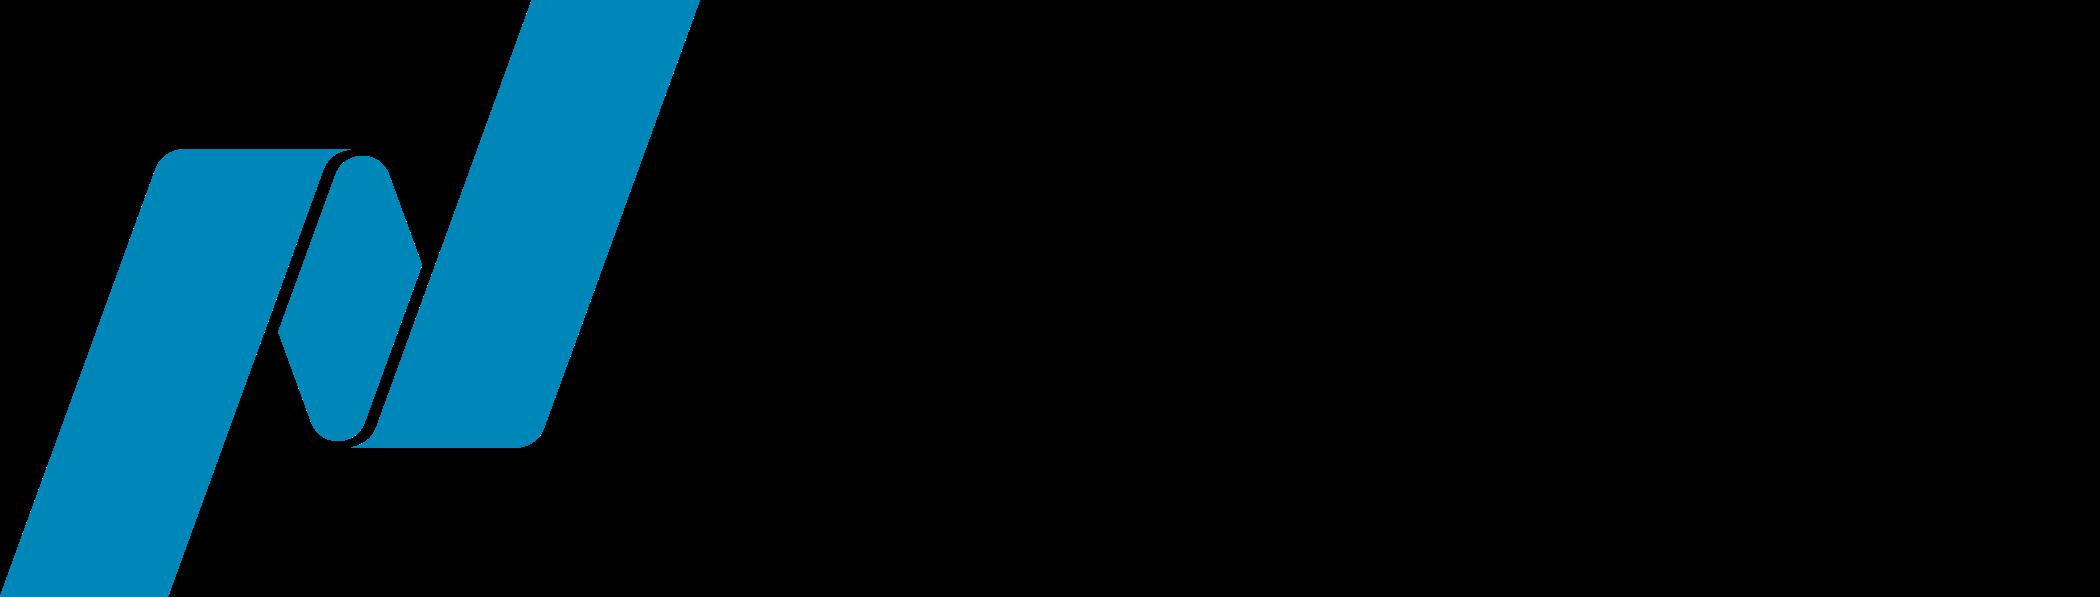 nasdaq logo 2 - Nasdaq Logo